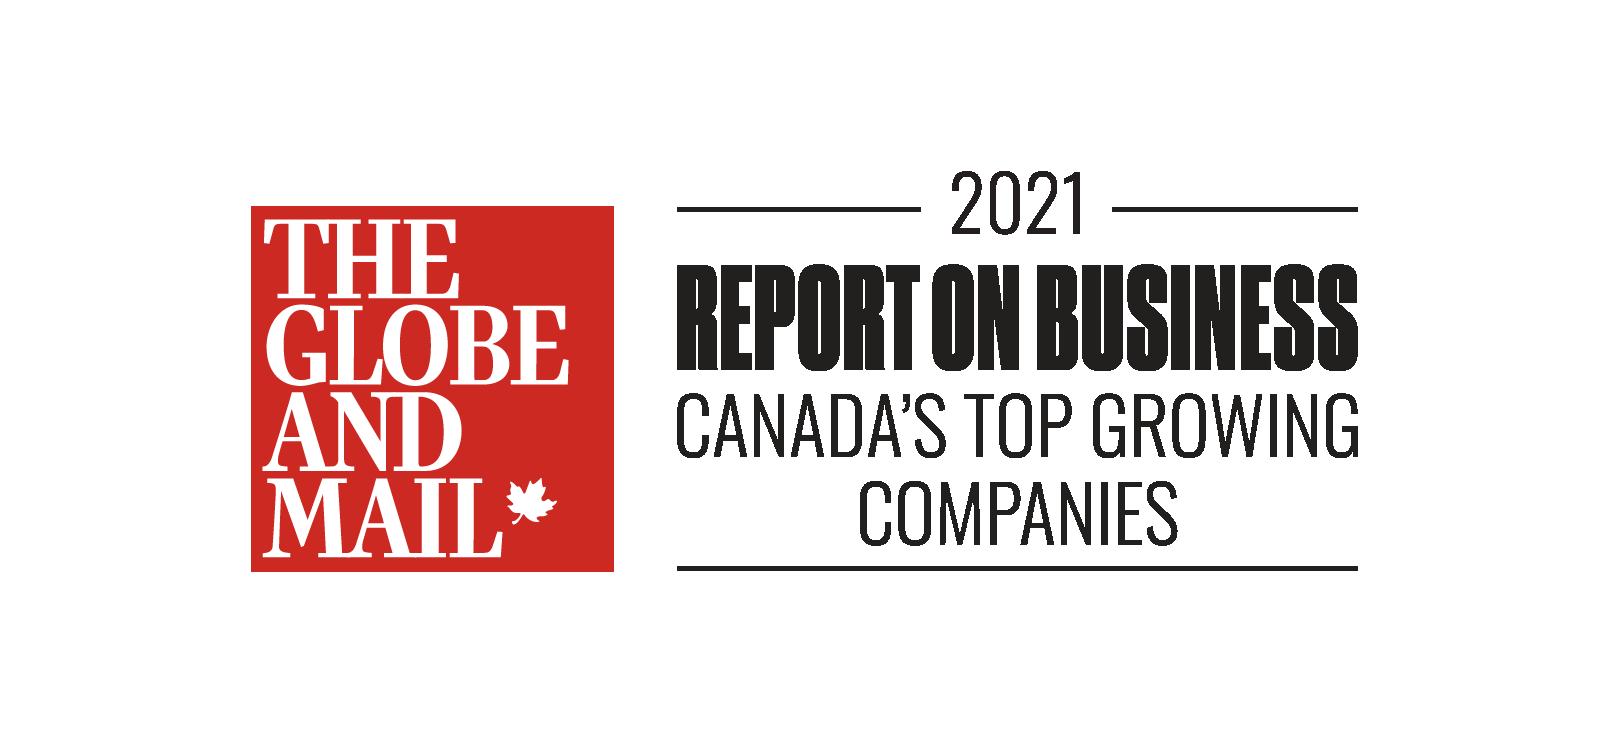 Canada's Top Growing Companies 2021